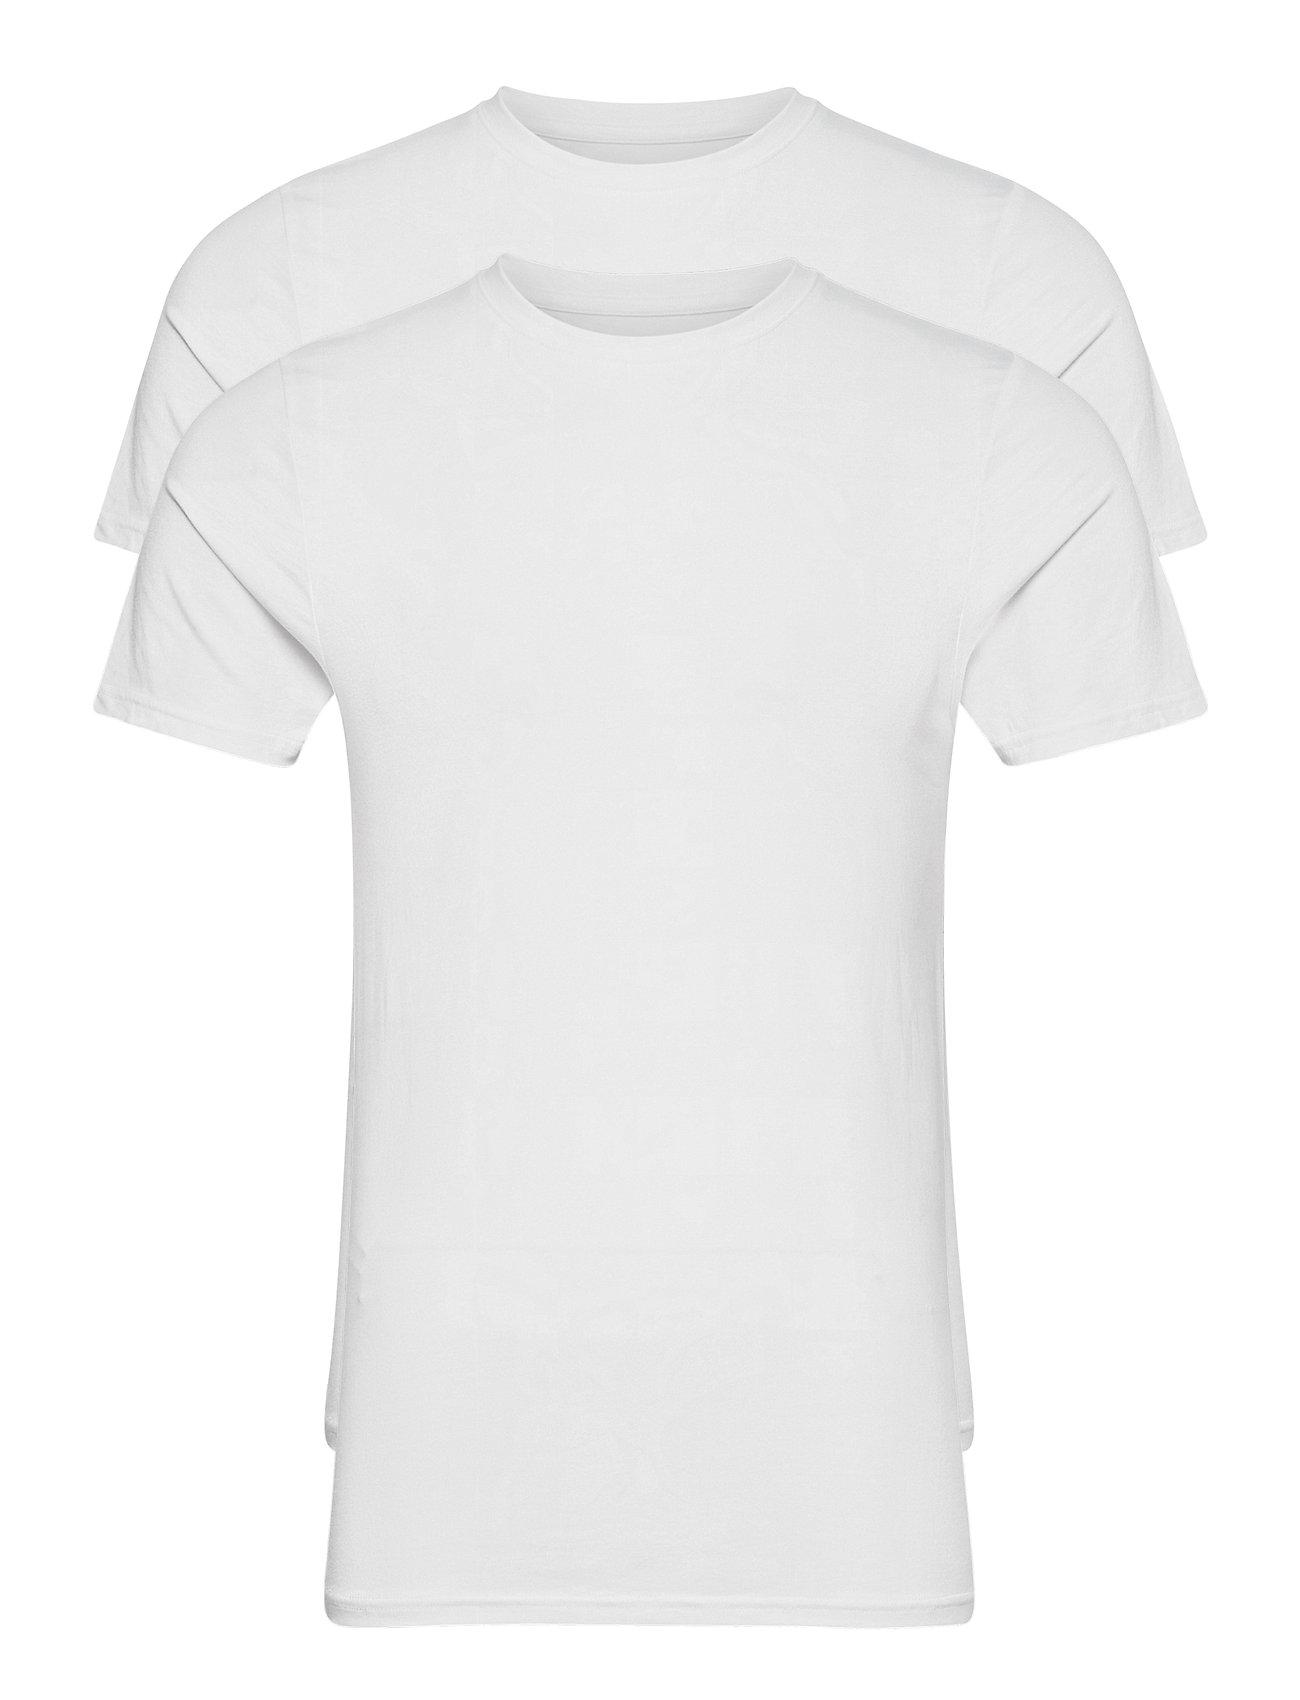 Image of Bamboo 2-Pack Tee T-shirt Hvid Resteröds (3456989851)